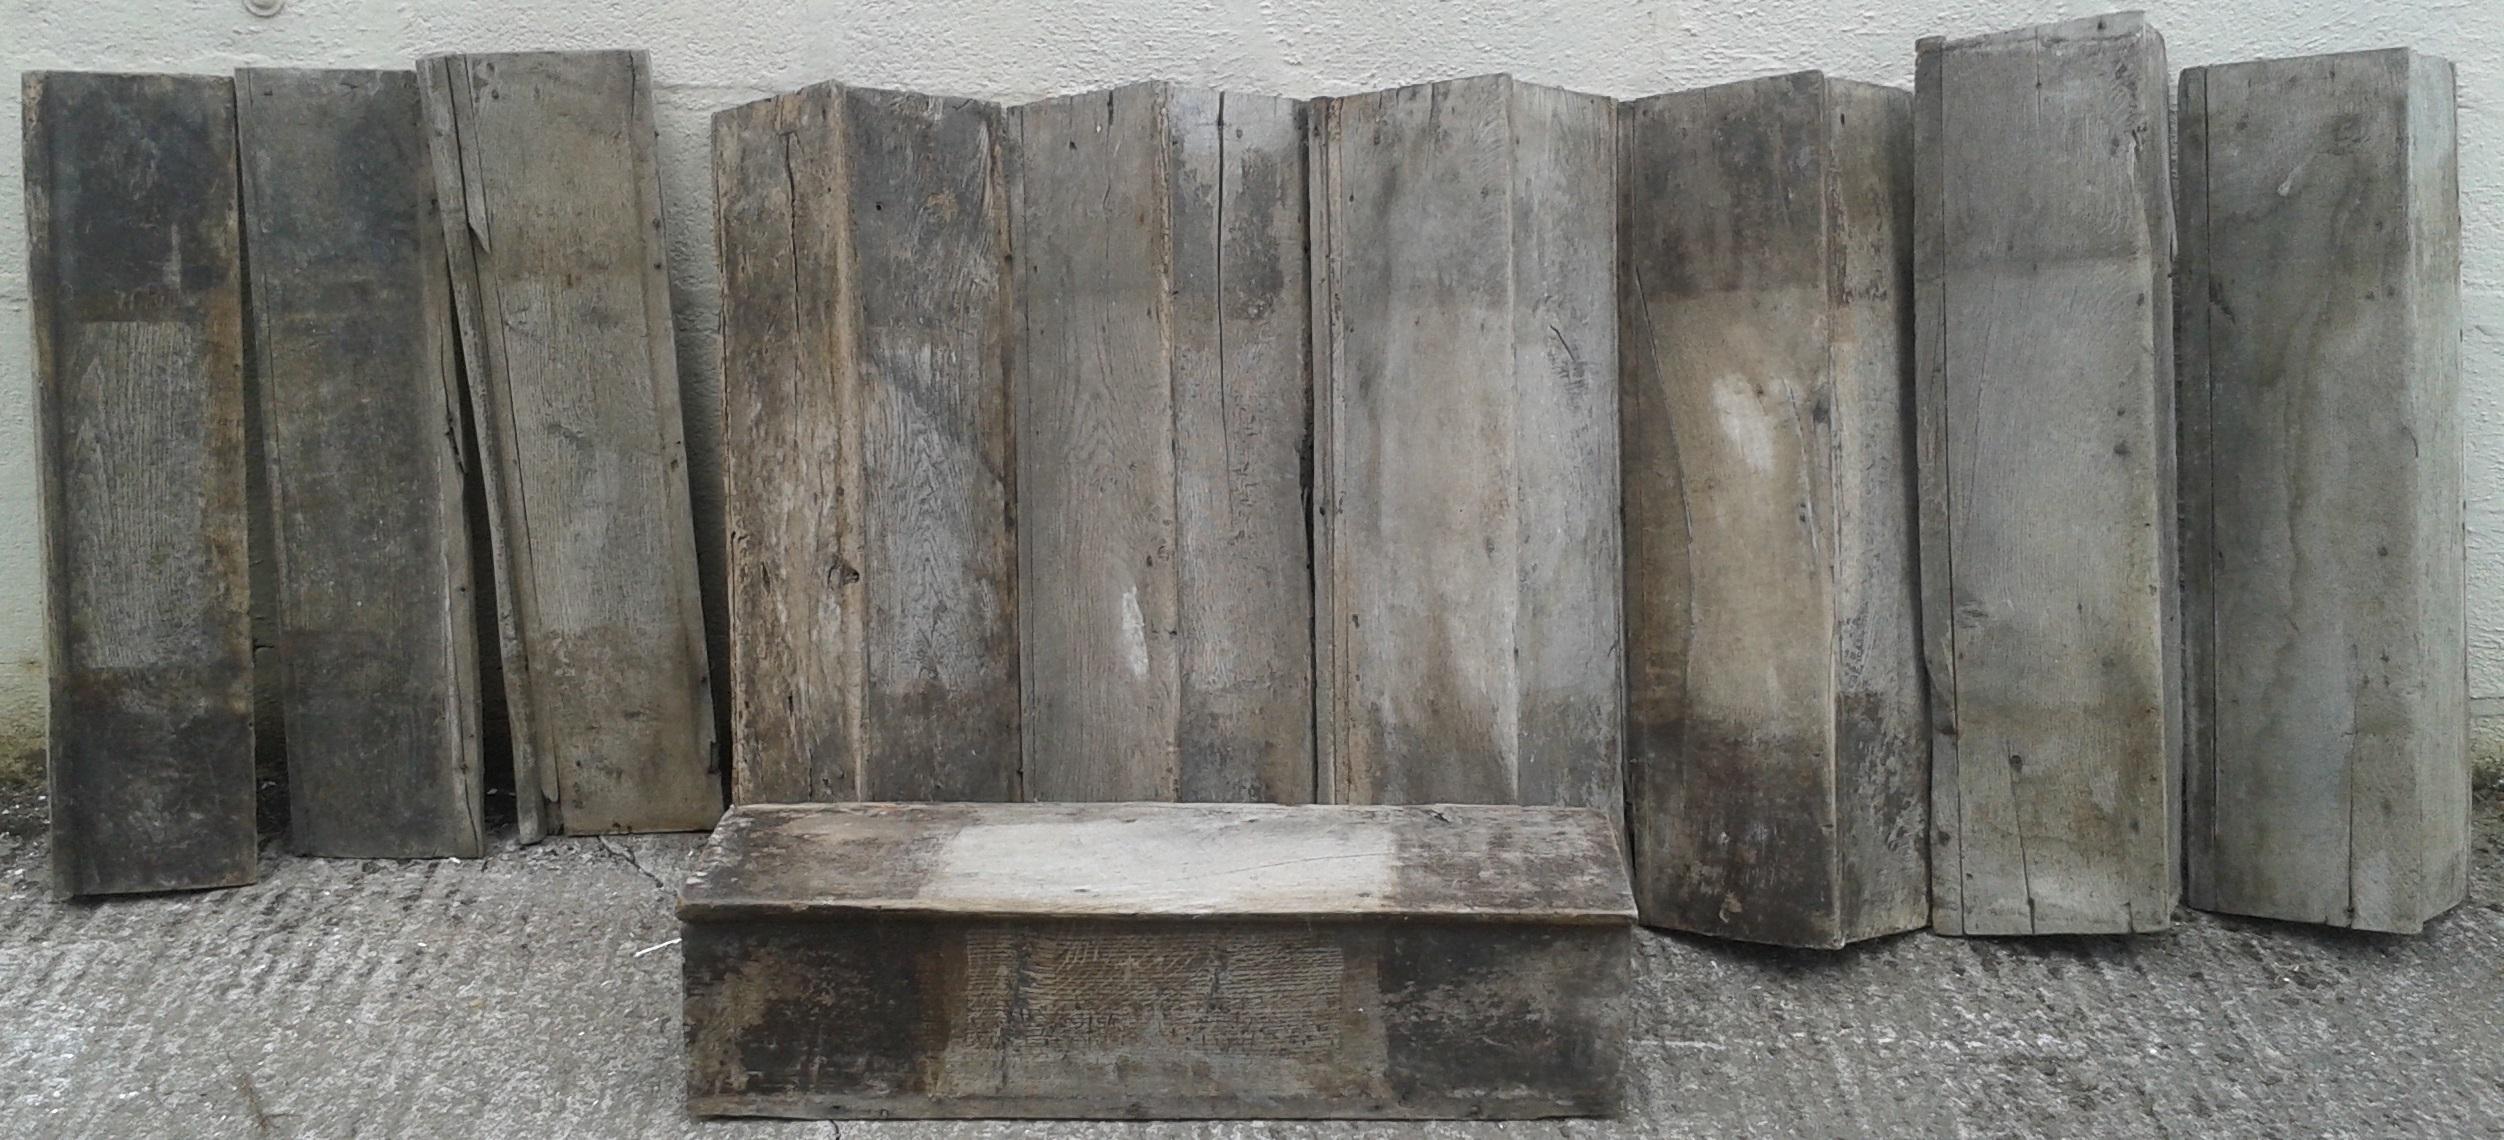 2016-22-04 18th Century oak staircase A